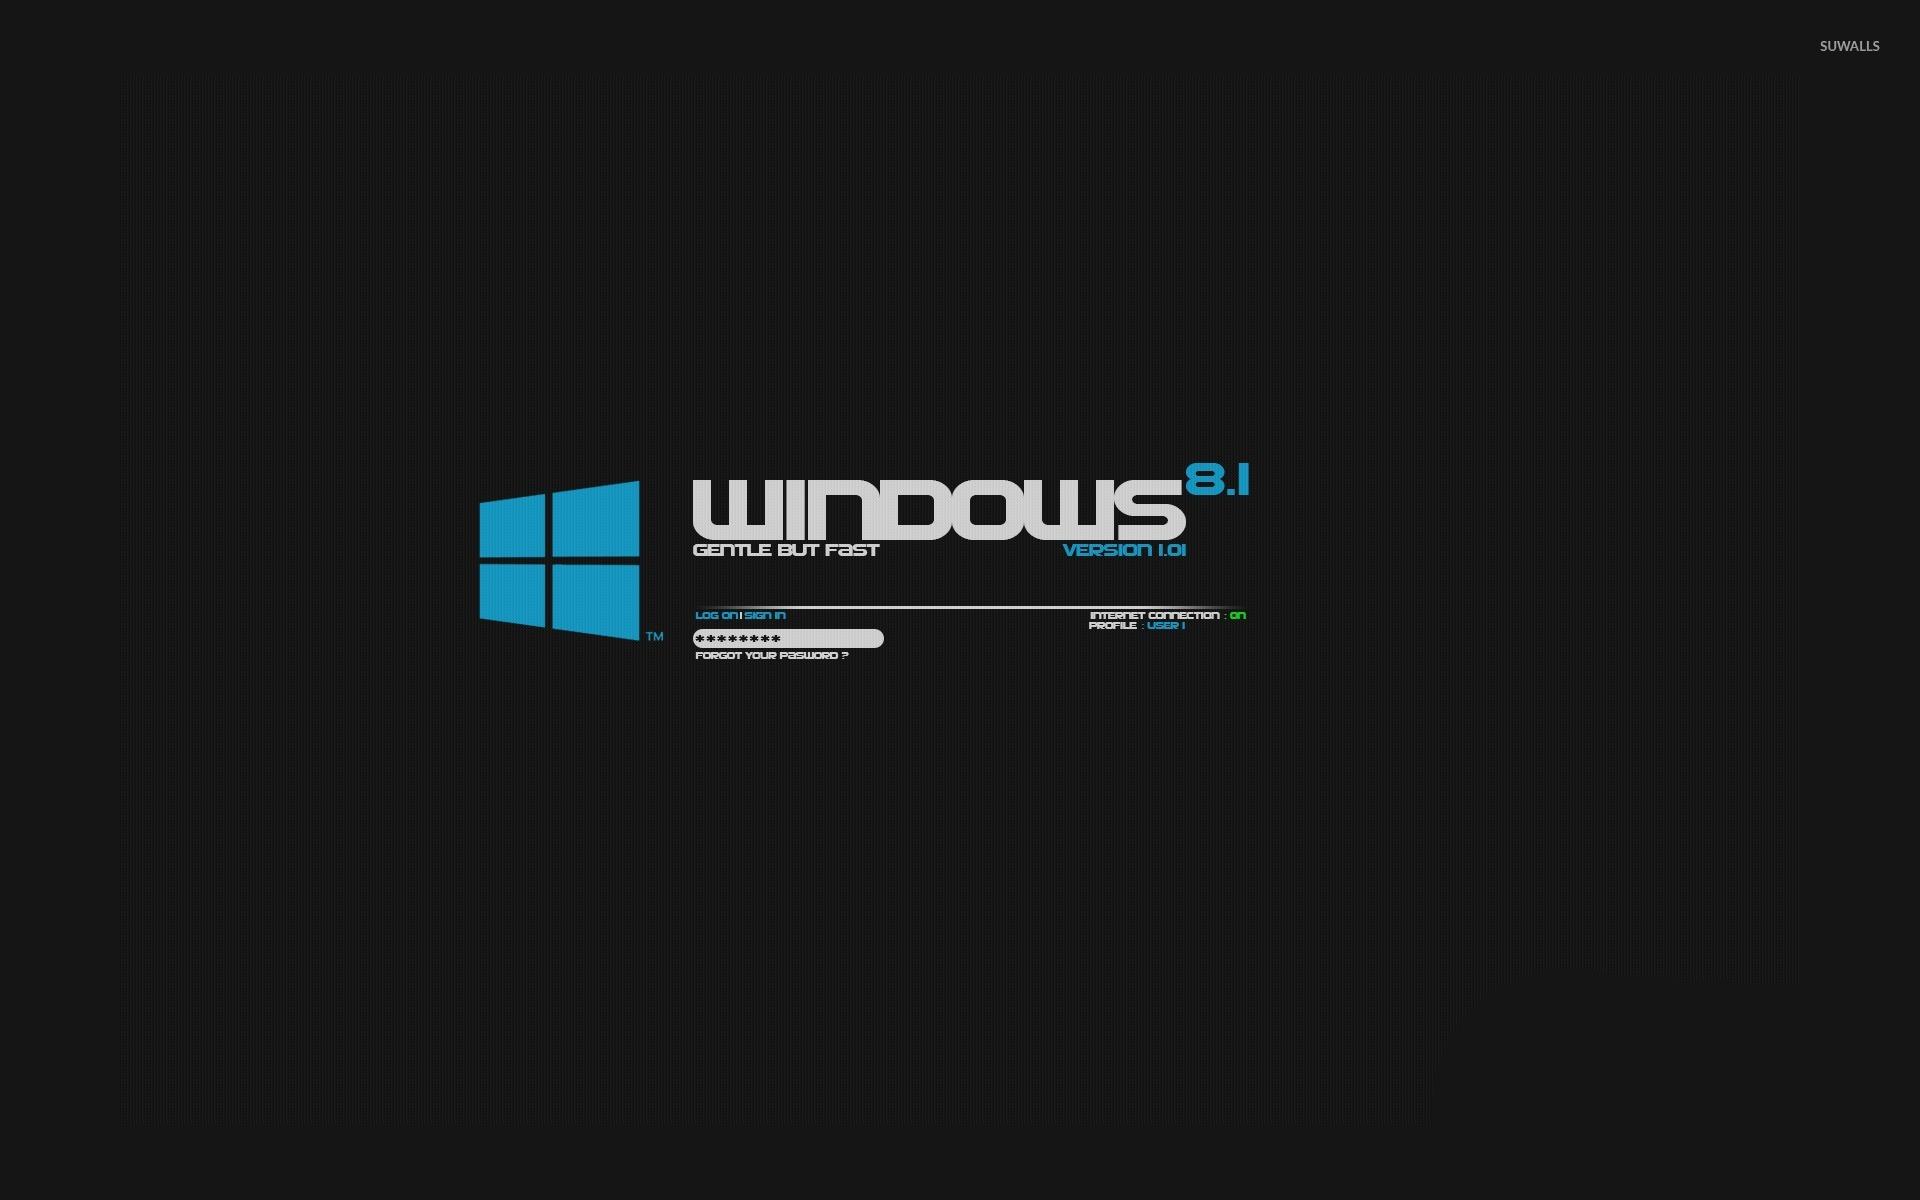 Windows 8 1 3 Wallpaper Computer Wallpapers 27876